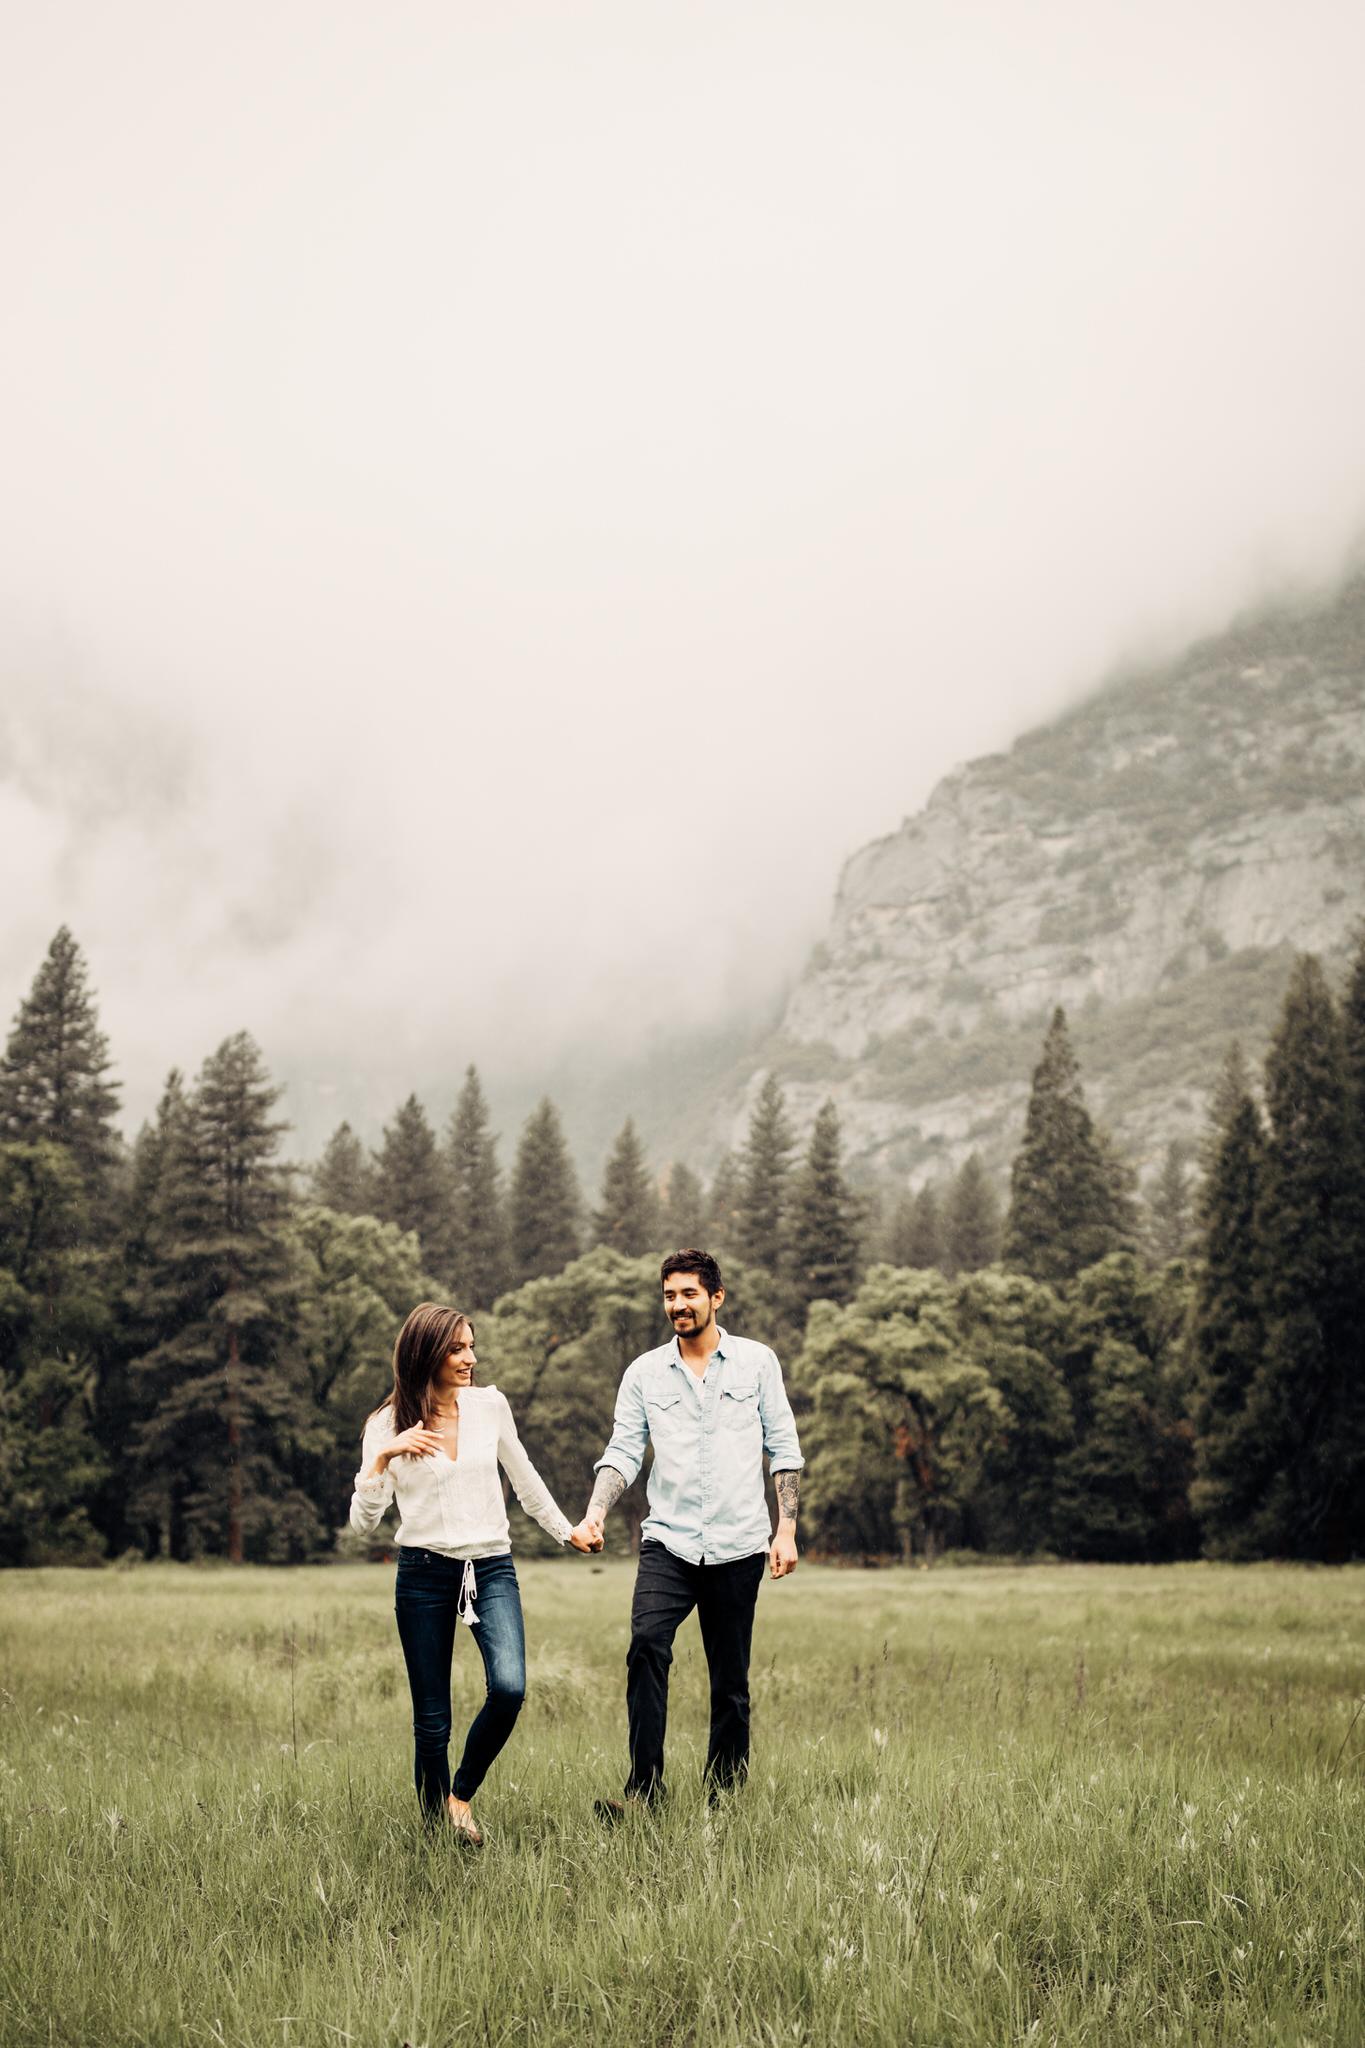 Yosemite-engagement-session-lauren-and-tom2.jpg